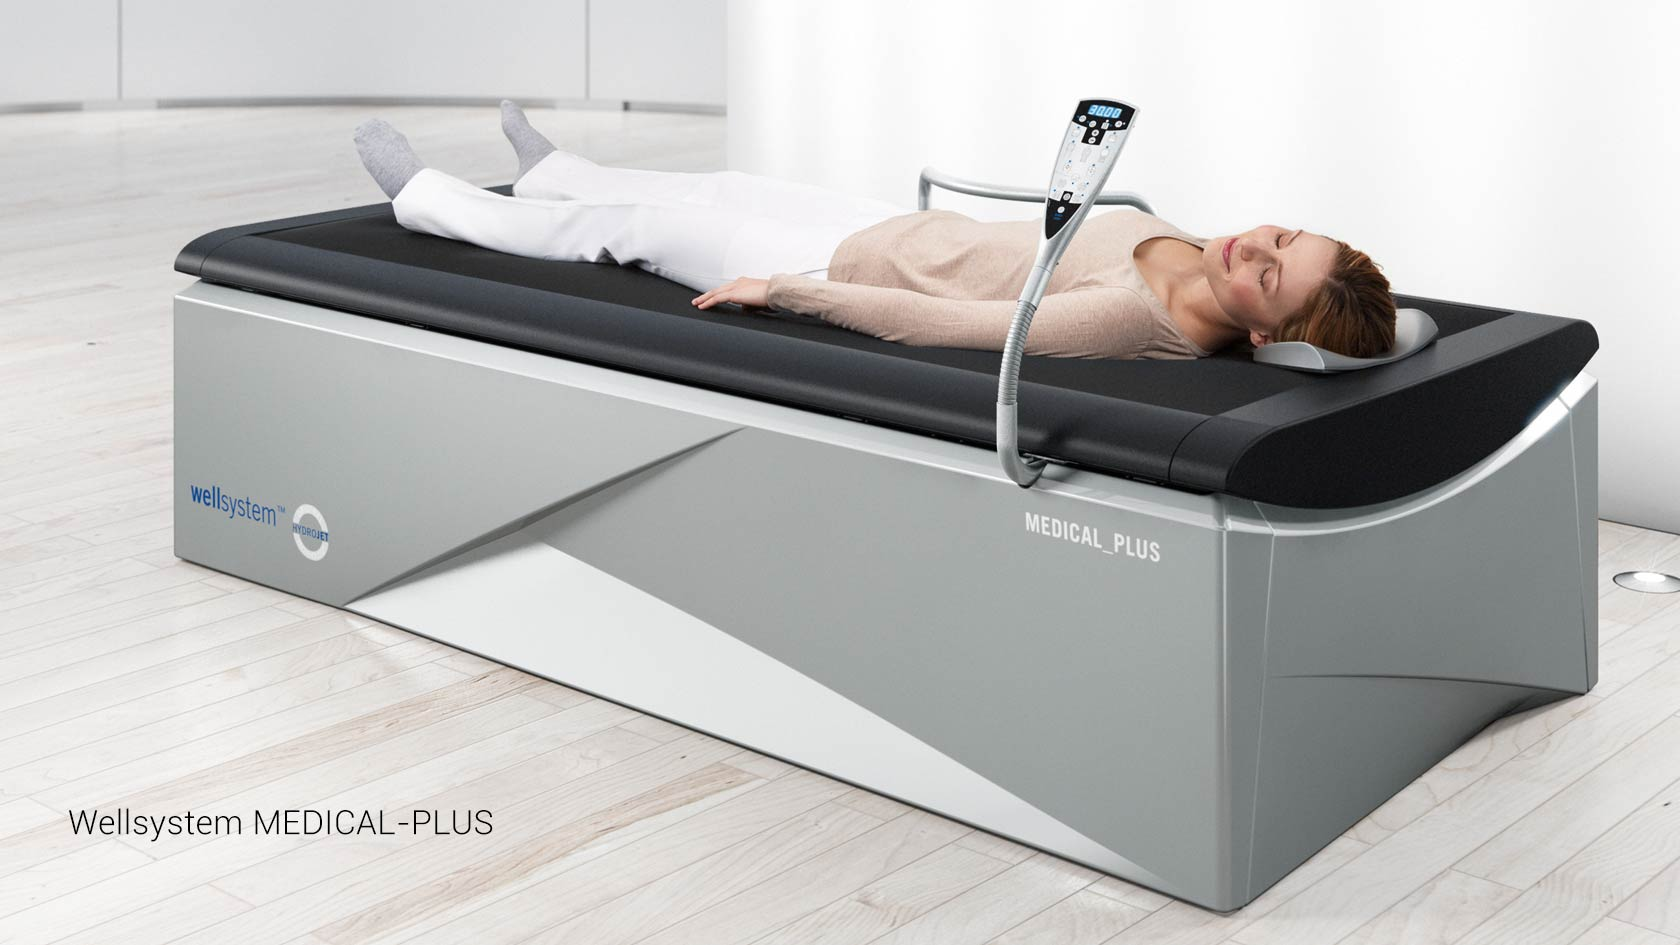 Wellsystem-MEDICAL-PLUS